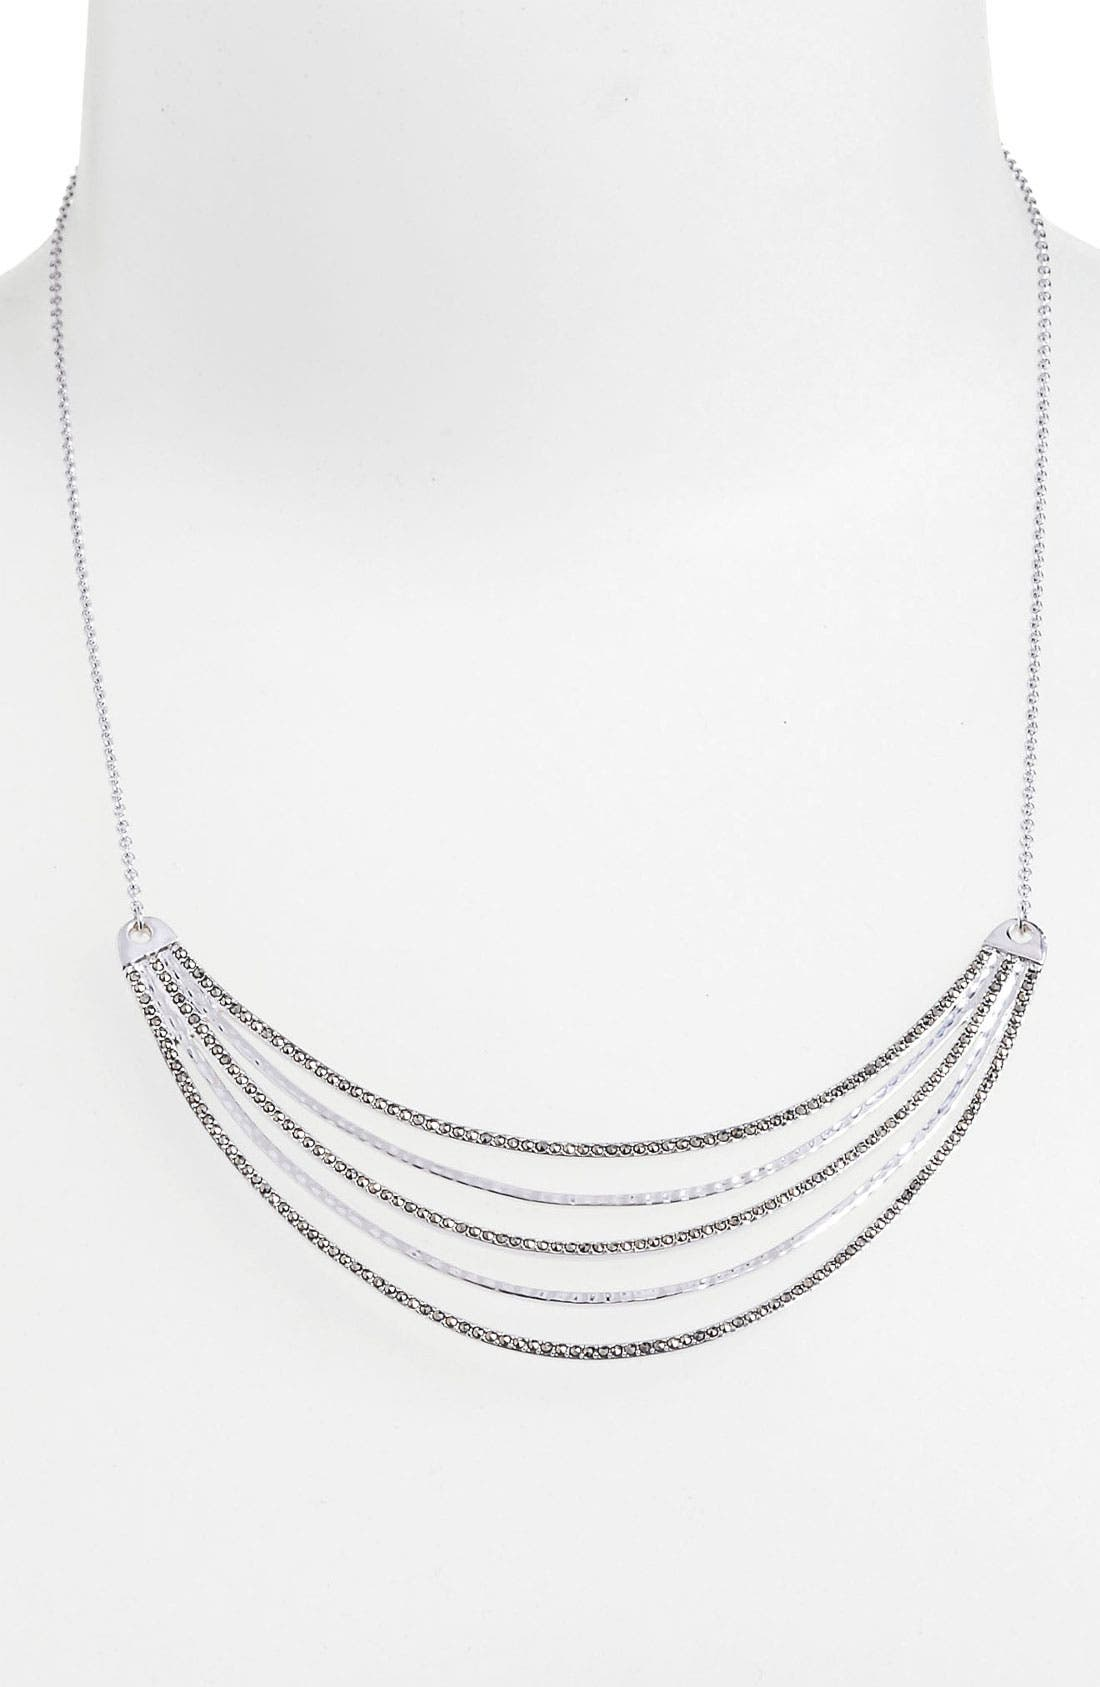 Main Image - Judith Jack 'Fluidity' Bib Necklace